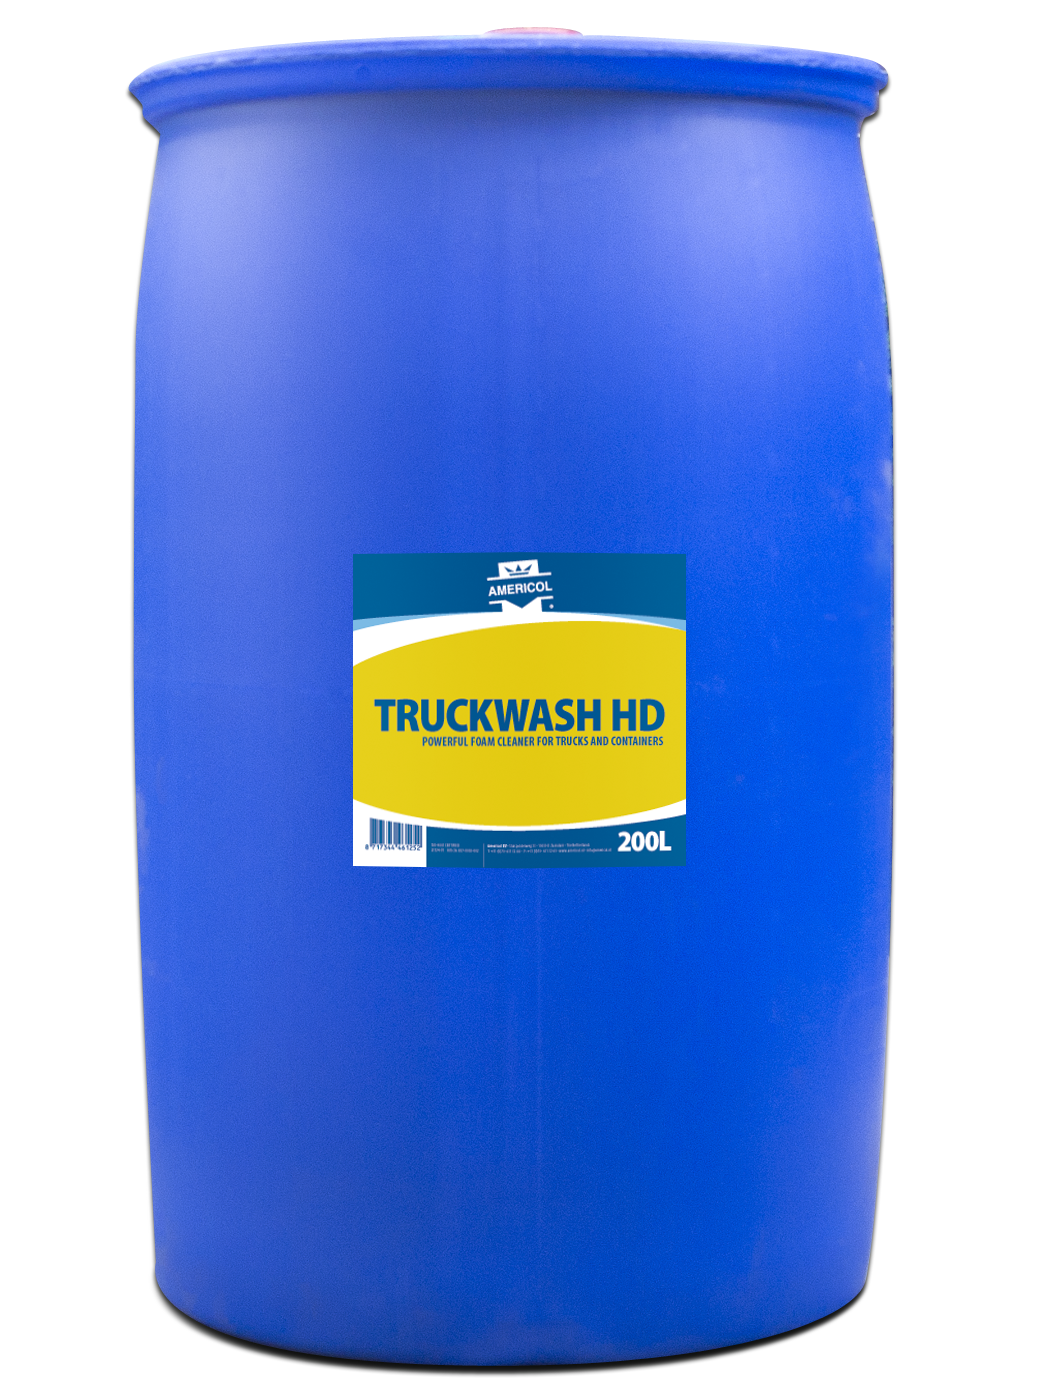 Truckwash HD 200L